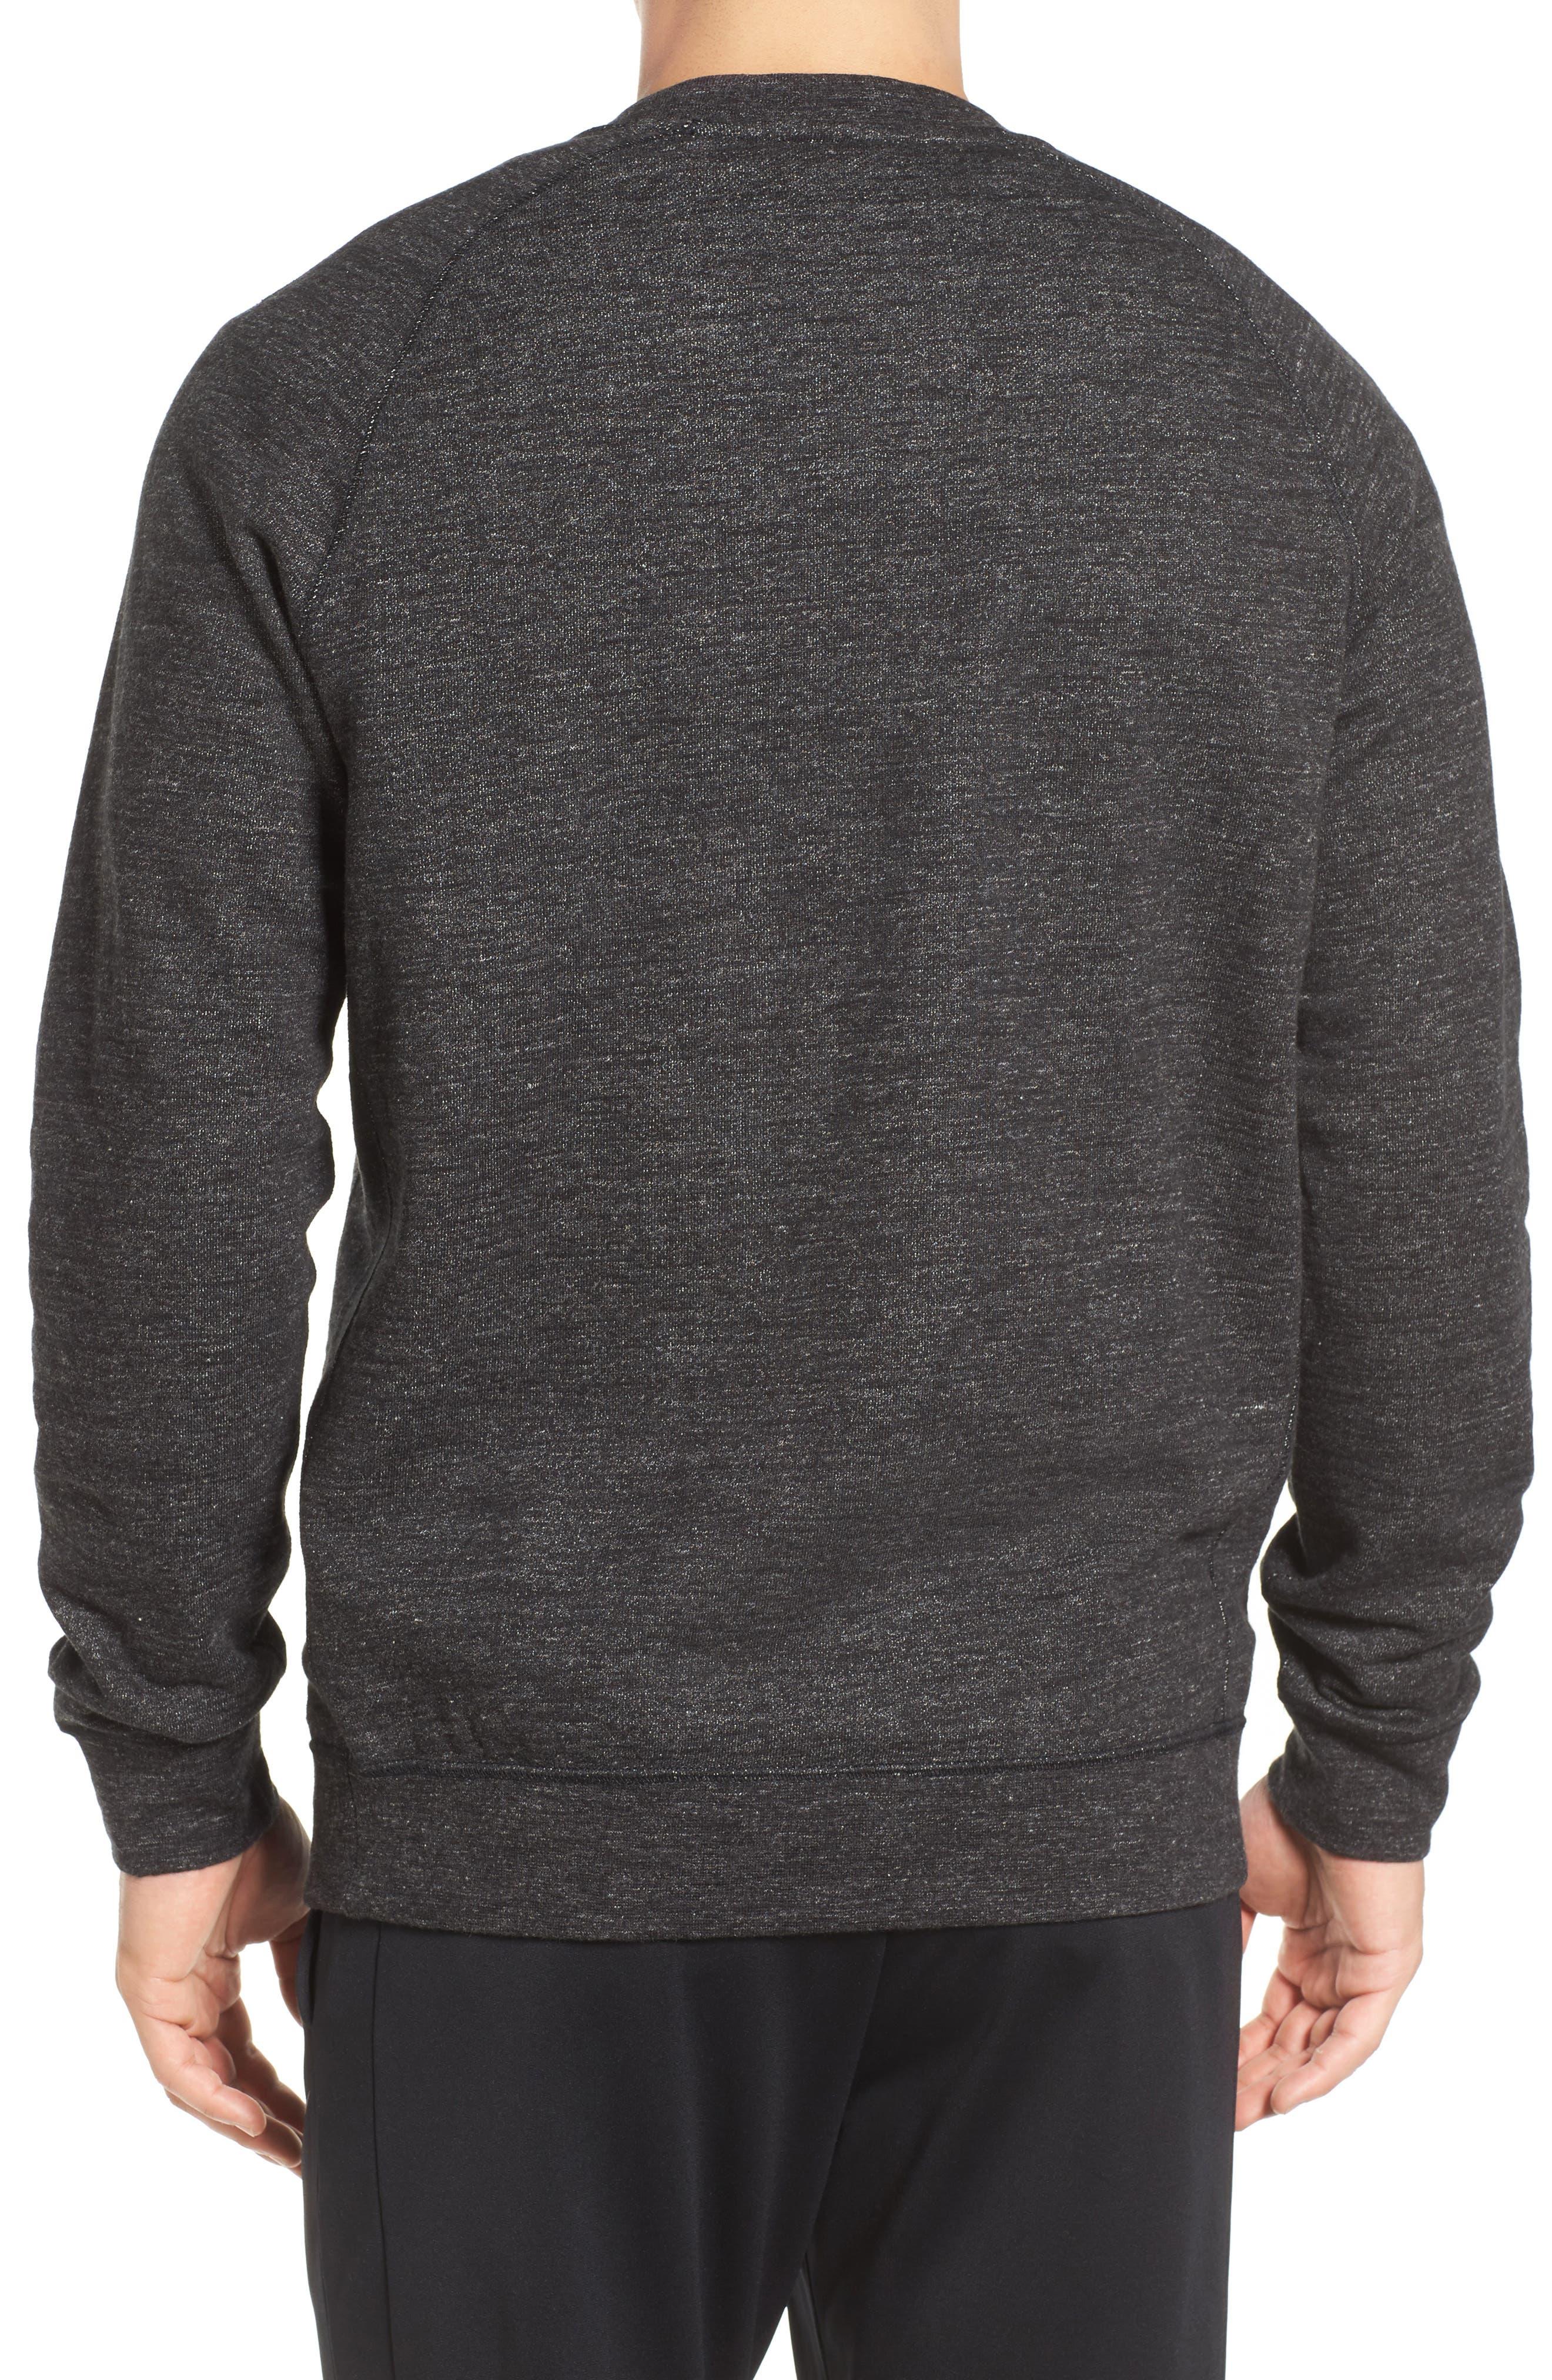 Alternate Image 2  - Nike Legacy Raglan Crewneck Sweatshirt